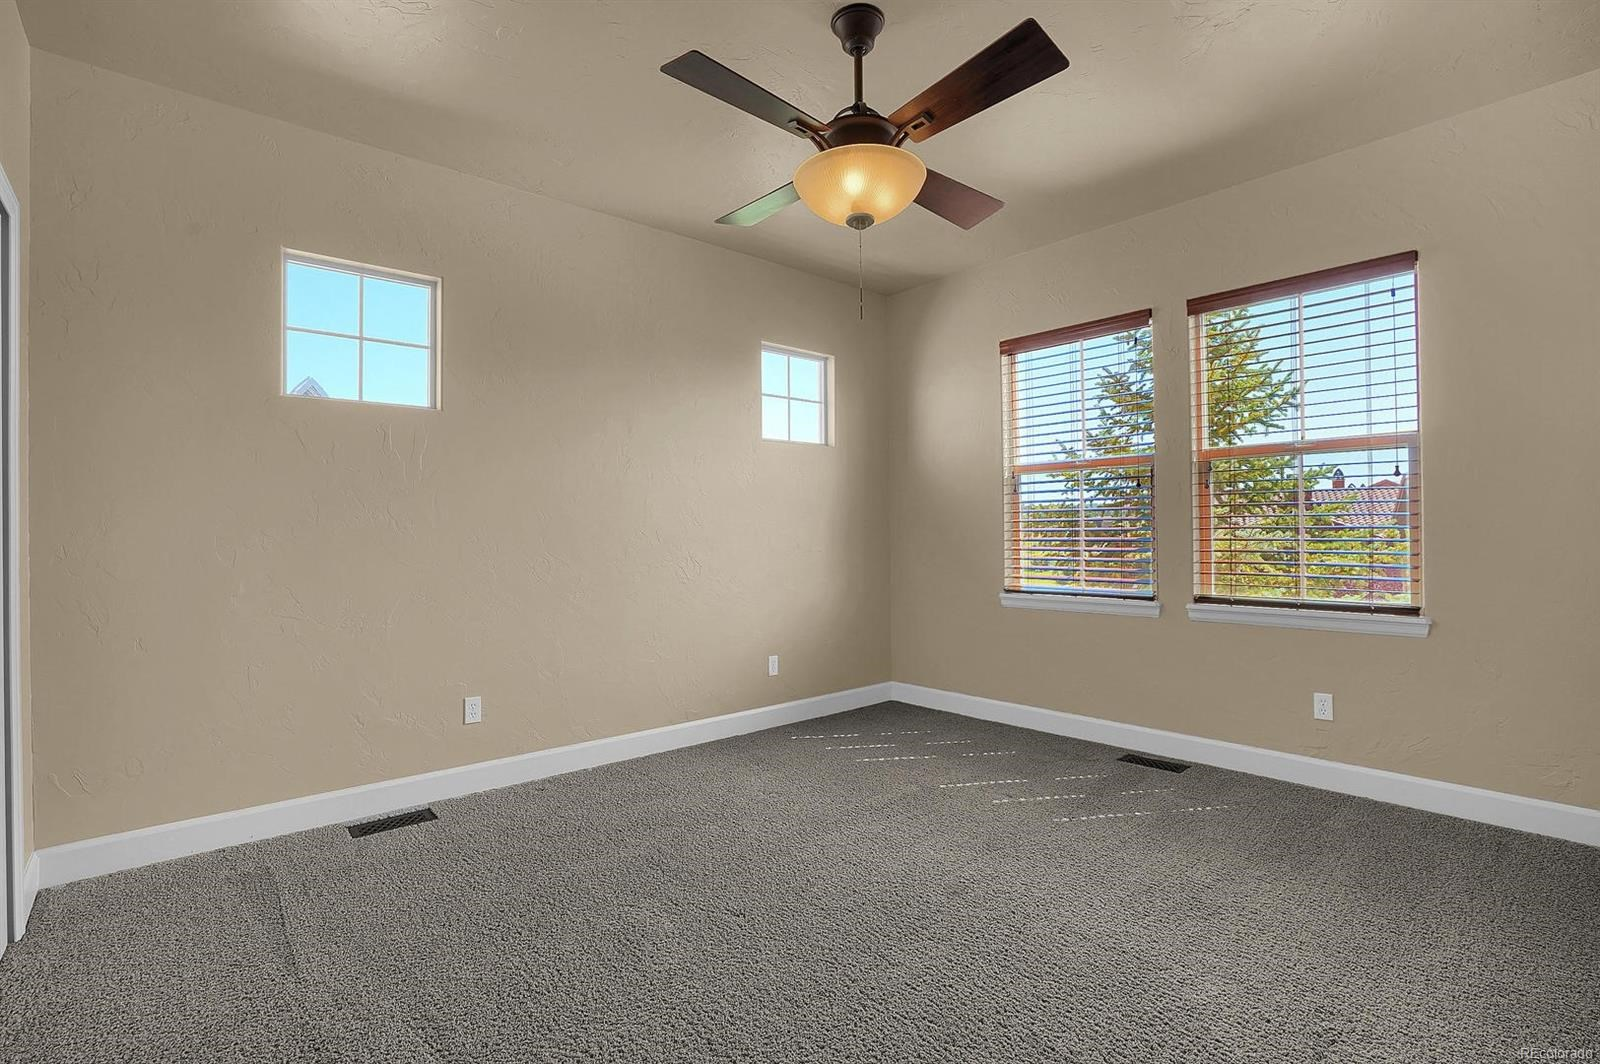 MLS# 7383029 - 16 - 2276 Rocking Horse Court, Colorado Springs, CO 80921